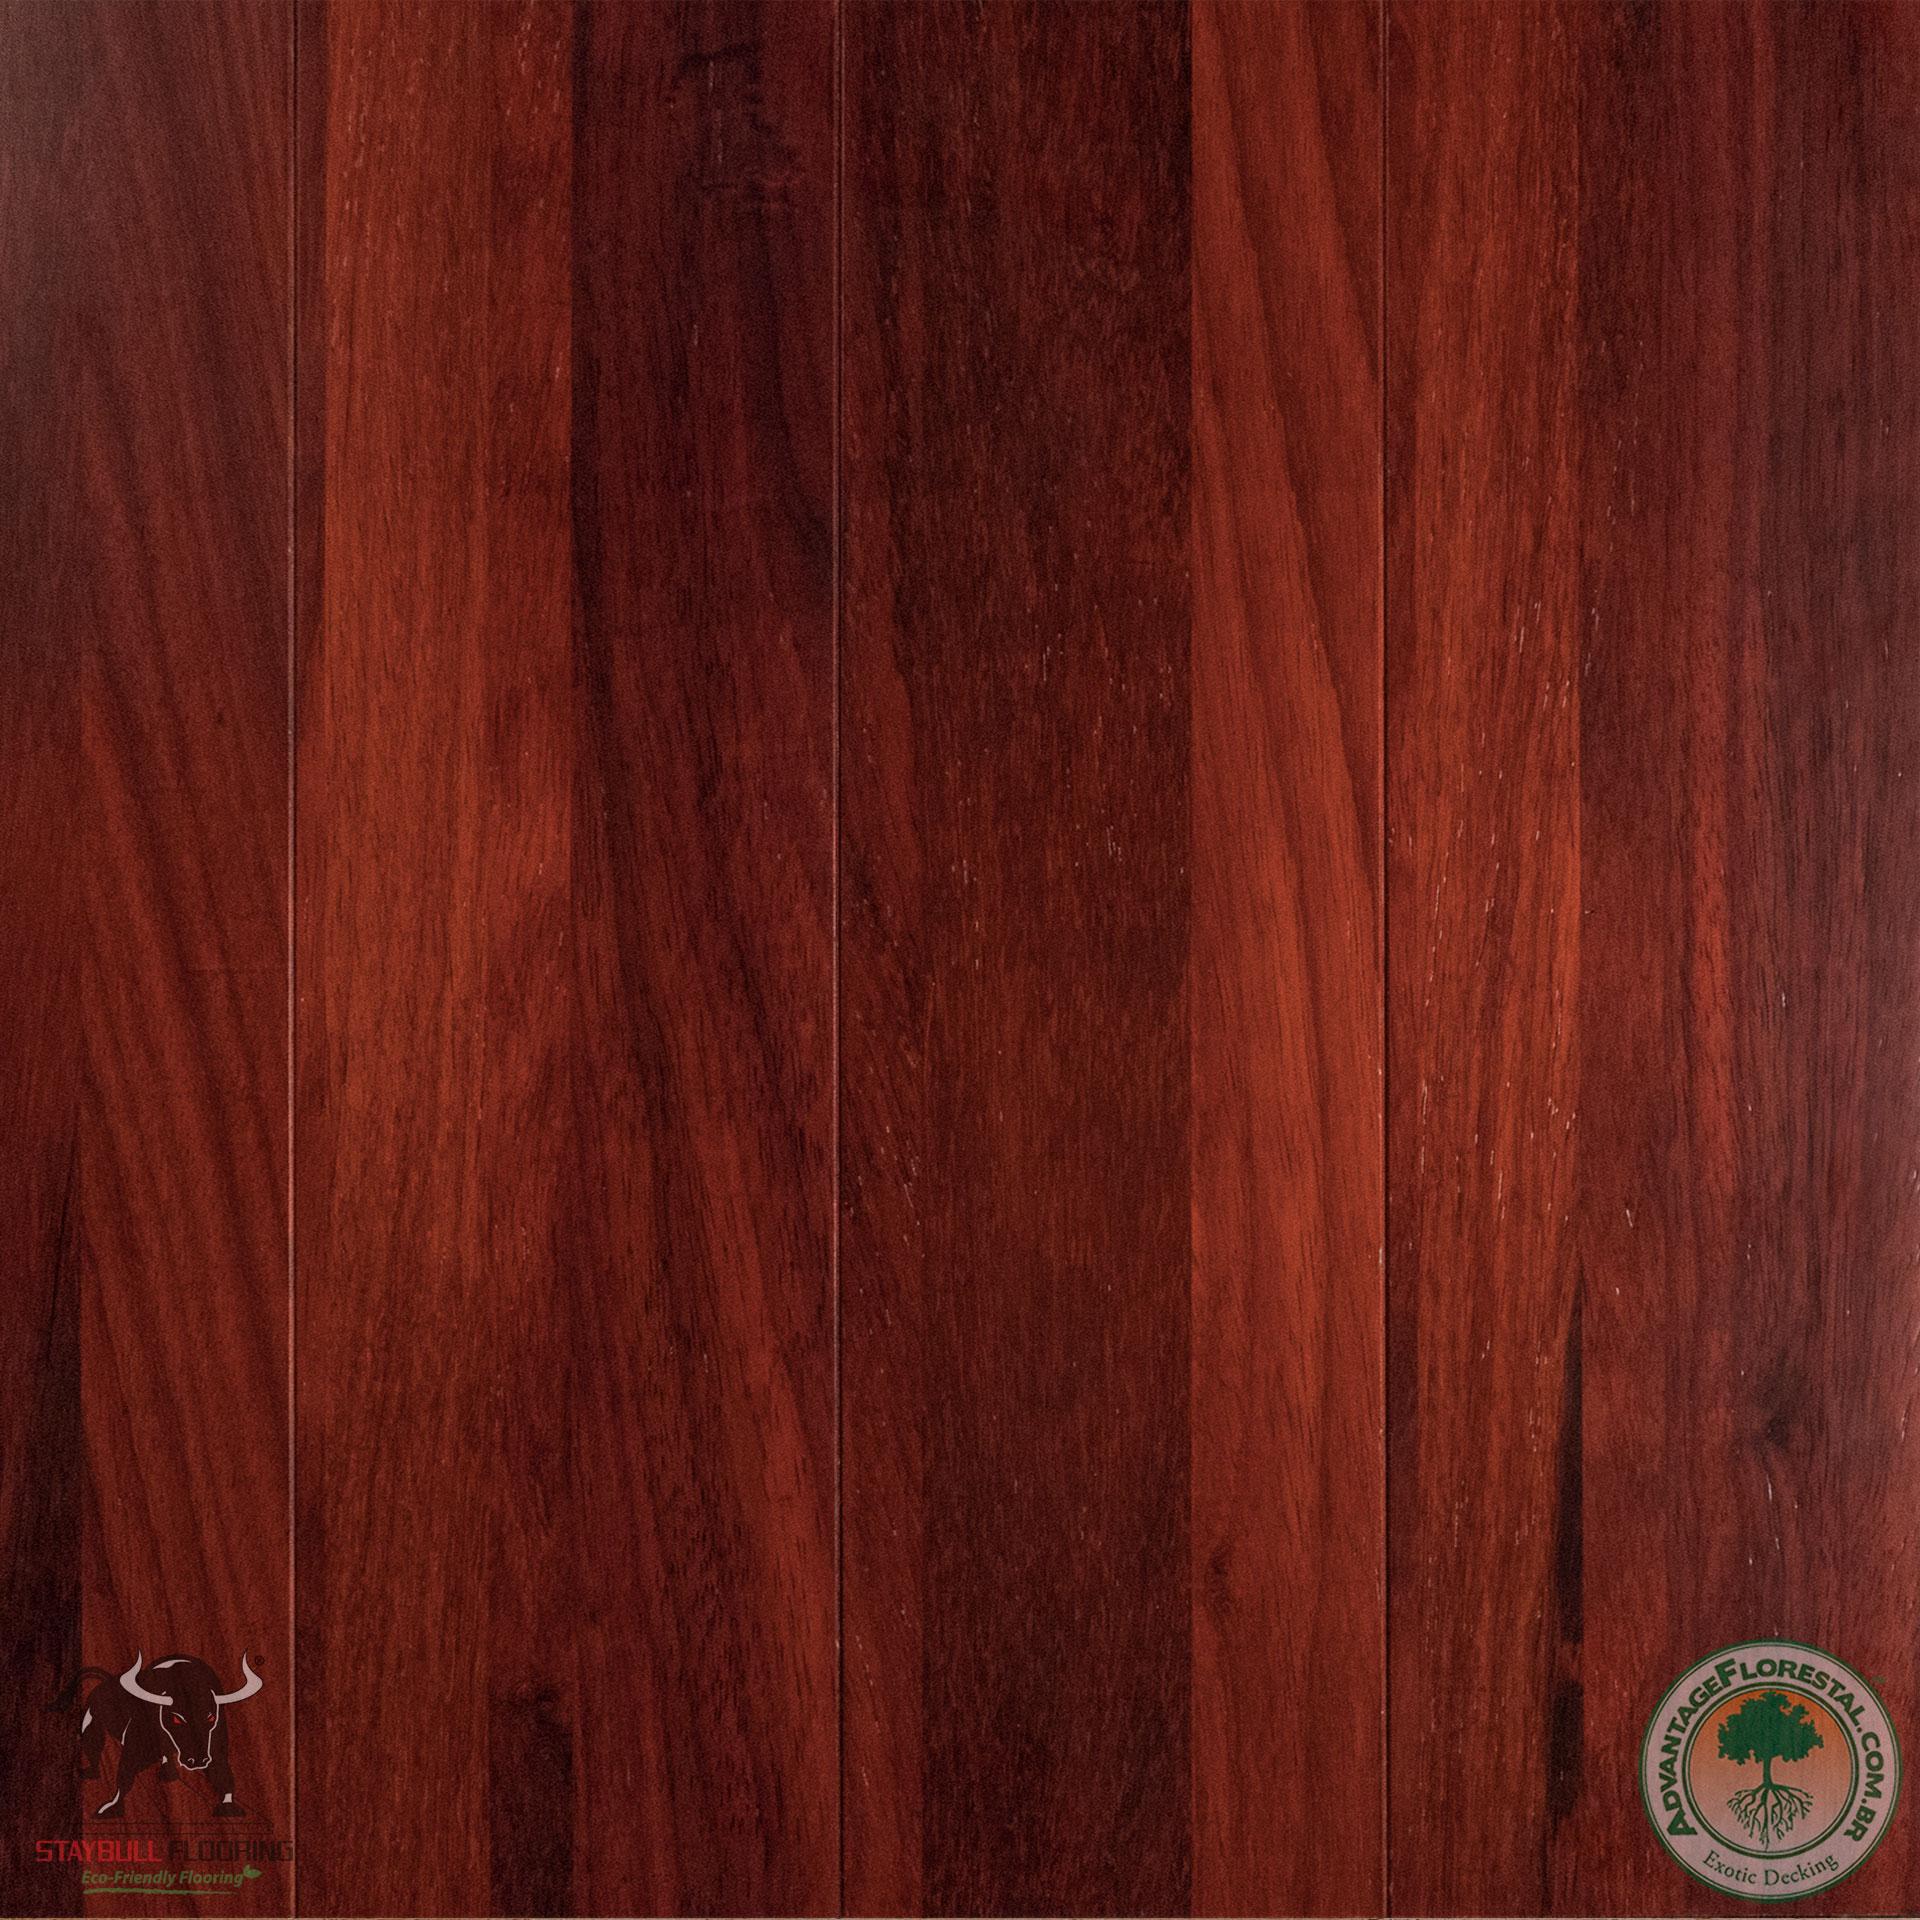 Wholesale StayBull African Padauk Hardwood Flooring